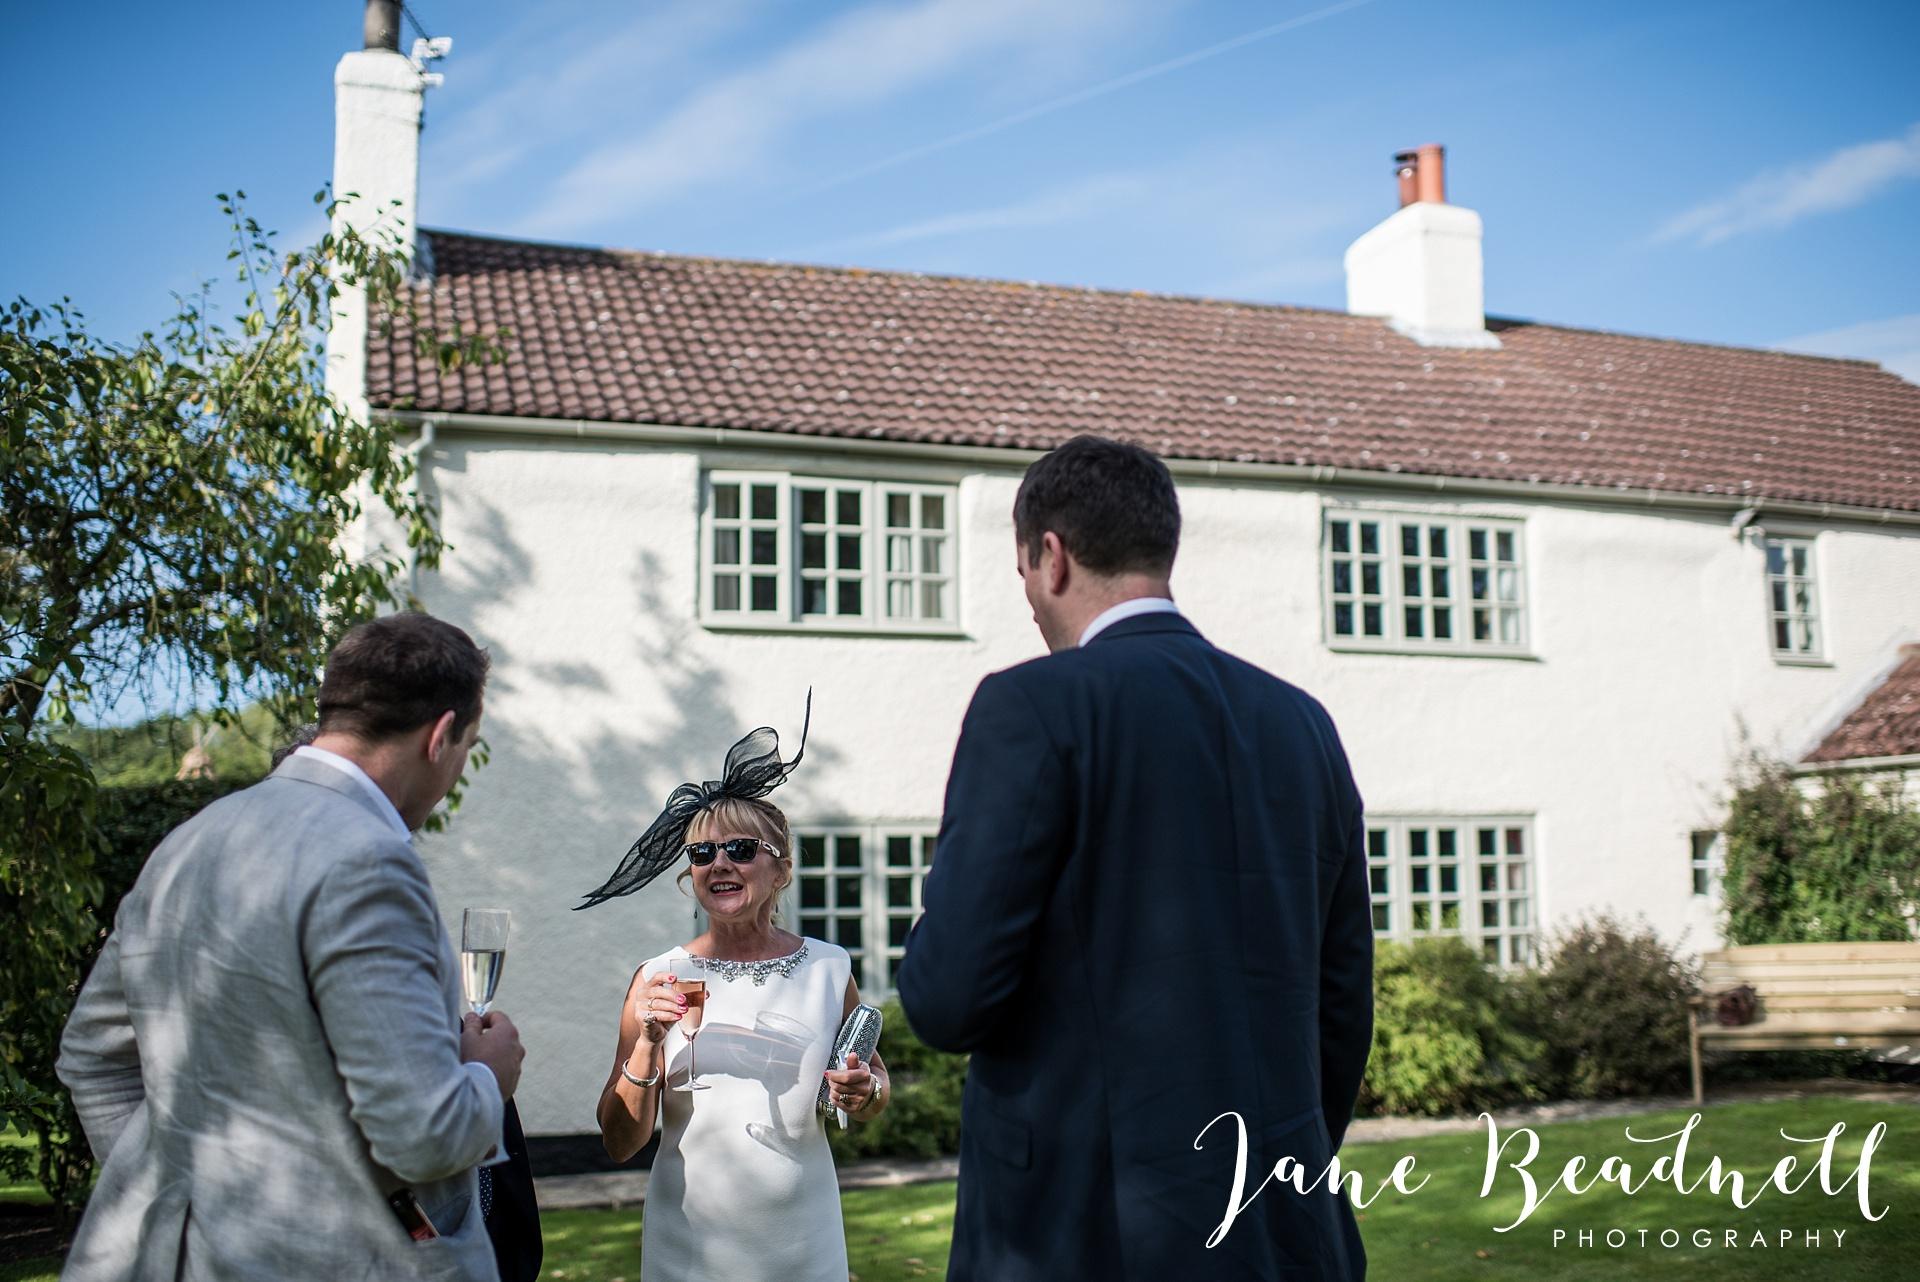 fine-art-wedding-photographer-jane-beadnell-yorkshire-wedding-photographer-garden-wedding_0074